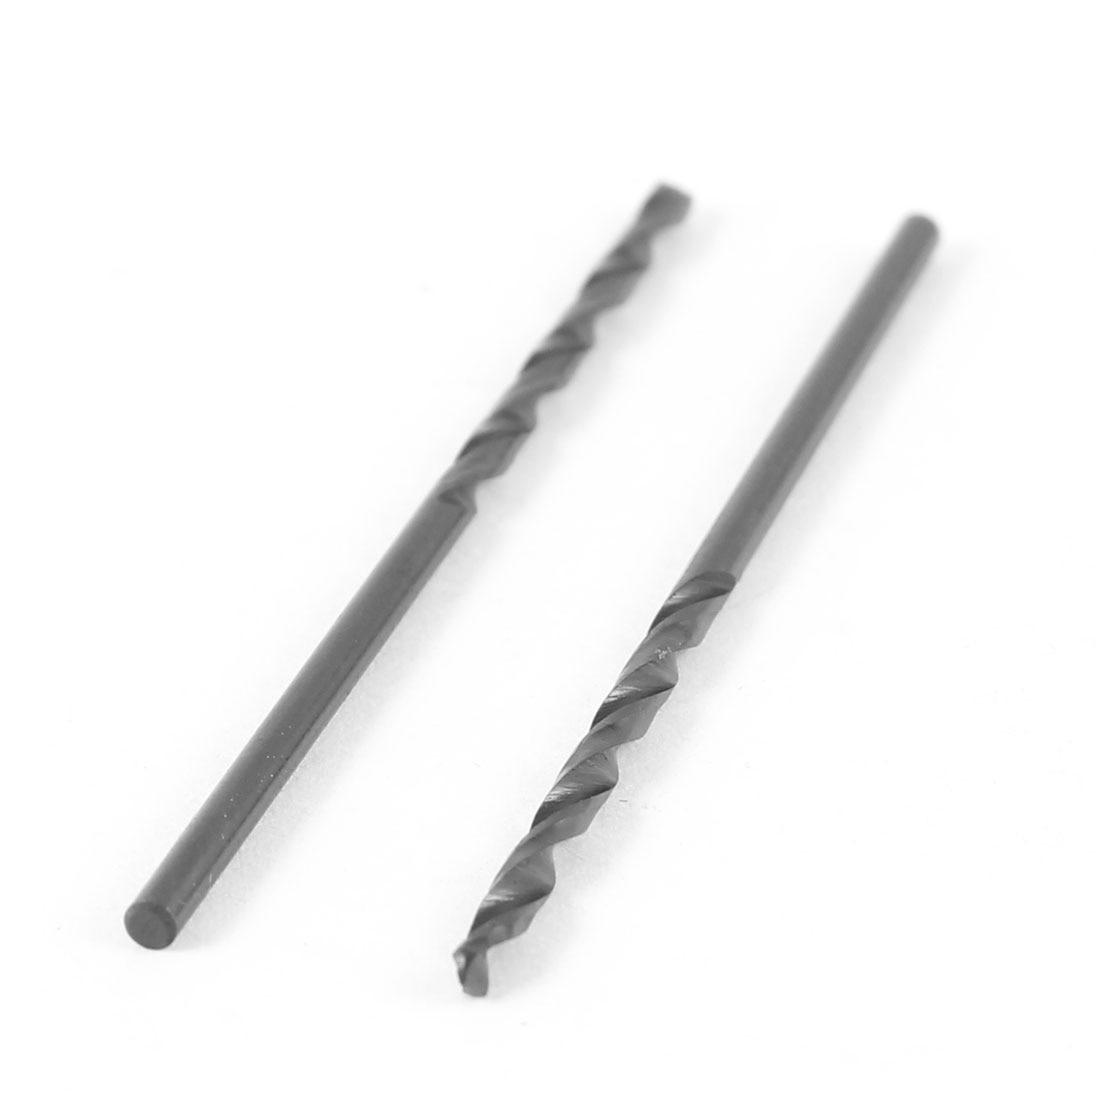 Подробнее о Uxcell 2 Pcs Micro Split Point Tip Hss High Speed Steel Twist Drill Bit Shank 1.7mm | 2.9mm | 2mm | 3.7mm | 4.2mm | 4.7mm | uxcell 14mm width tip sds plus shank masonry hammering drill bit